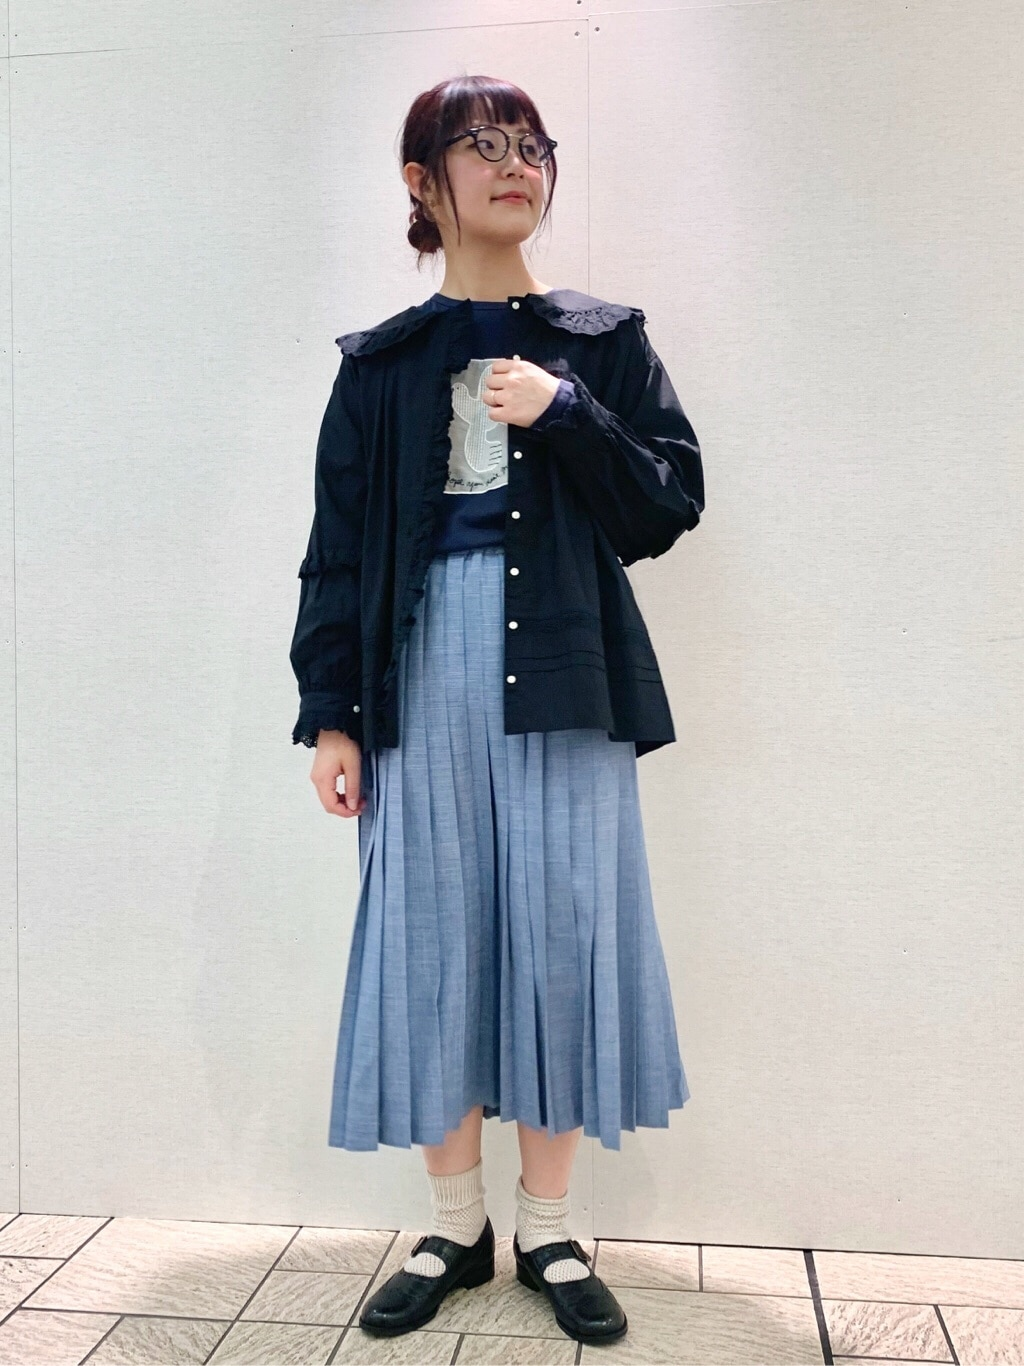 chambre de charme 横浜ジョイナス 身長:162cm 2021.02.16